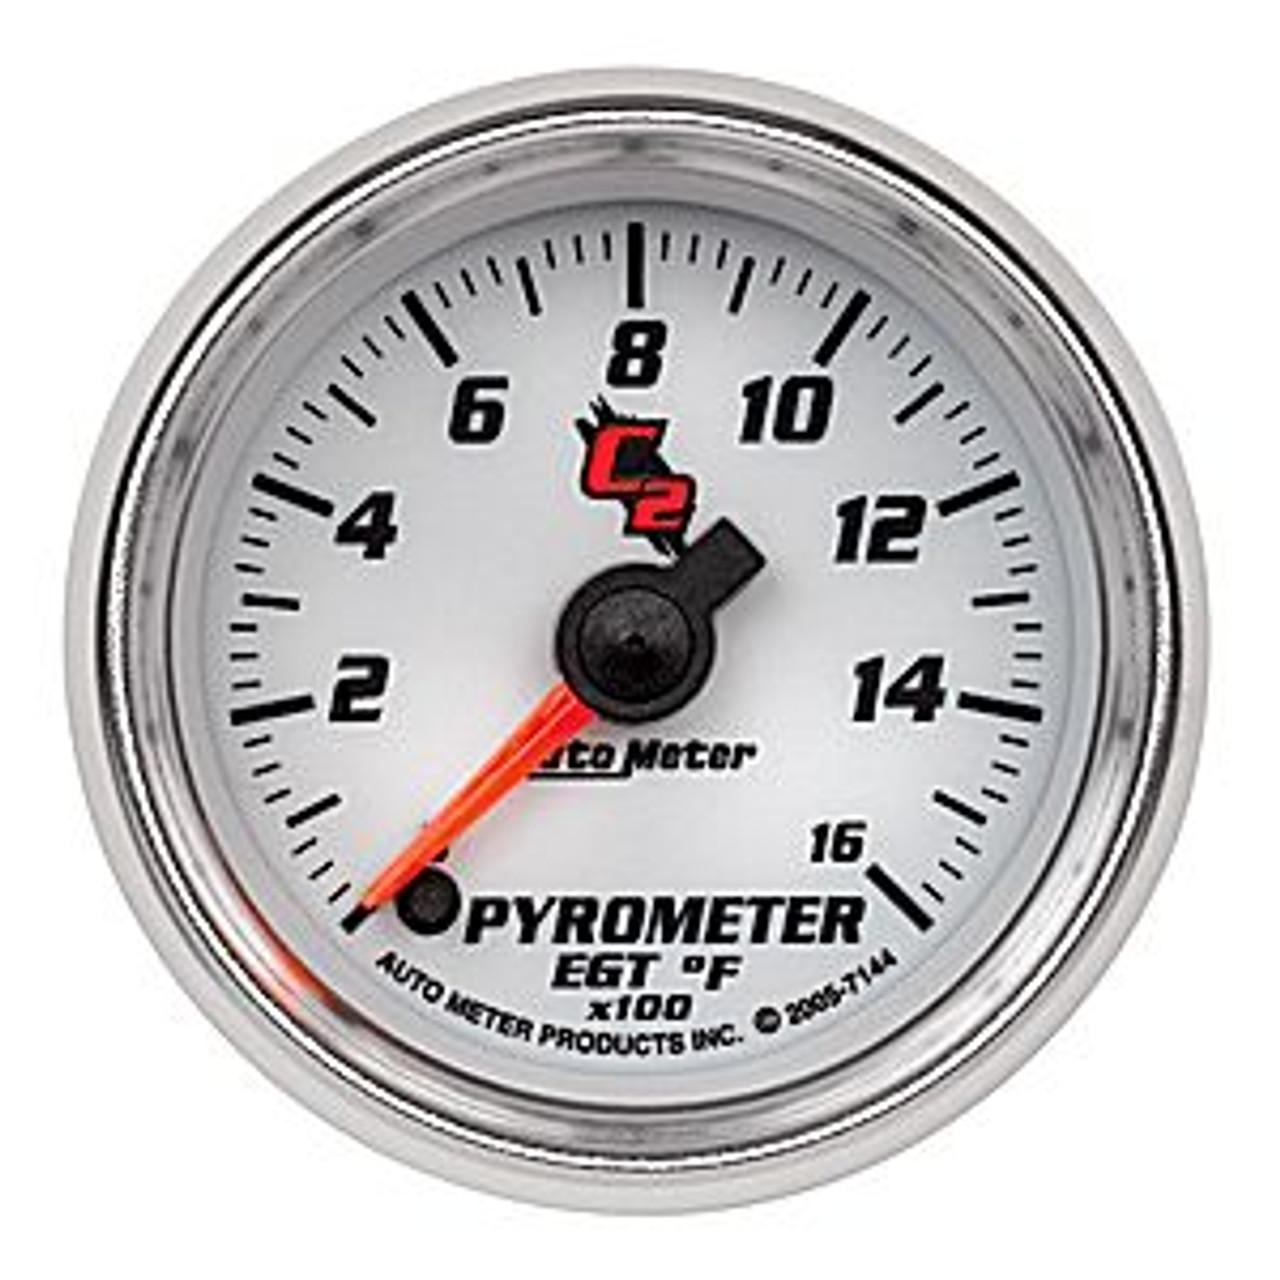 Autometer C2-2 Pyrometer, 0-1600`F, 2In.